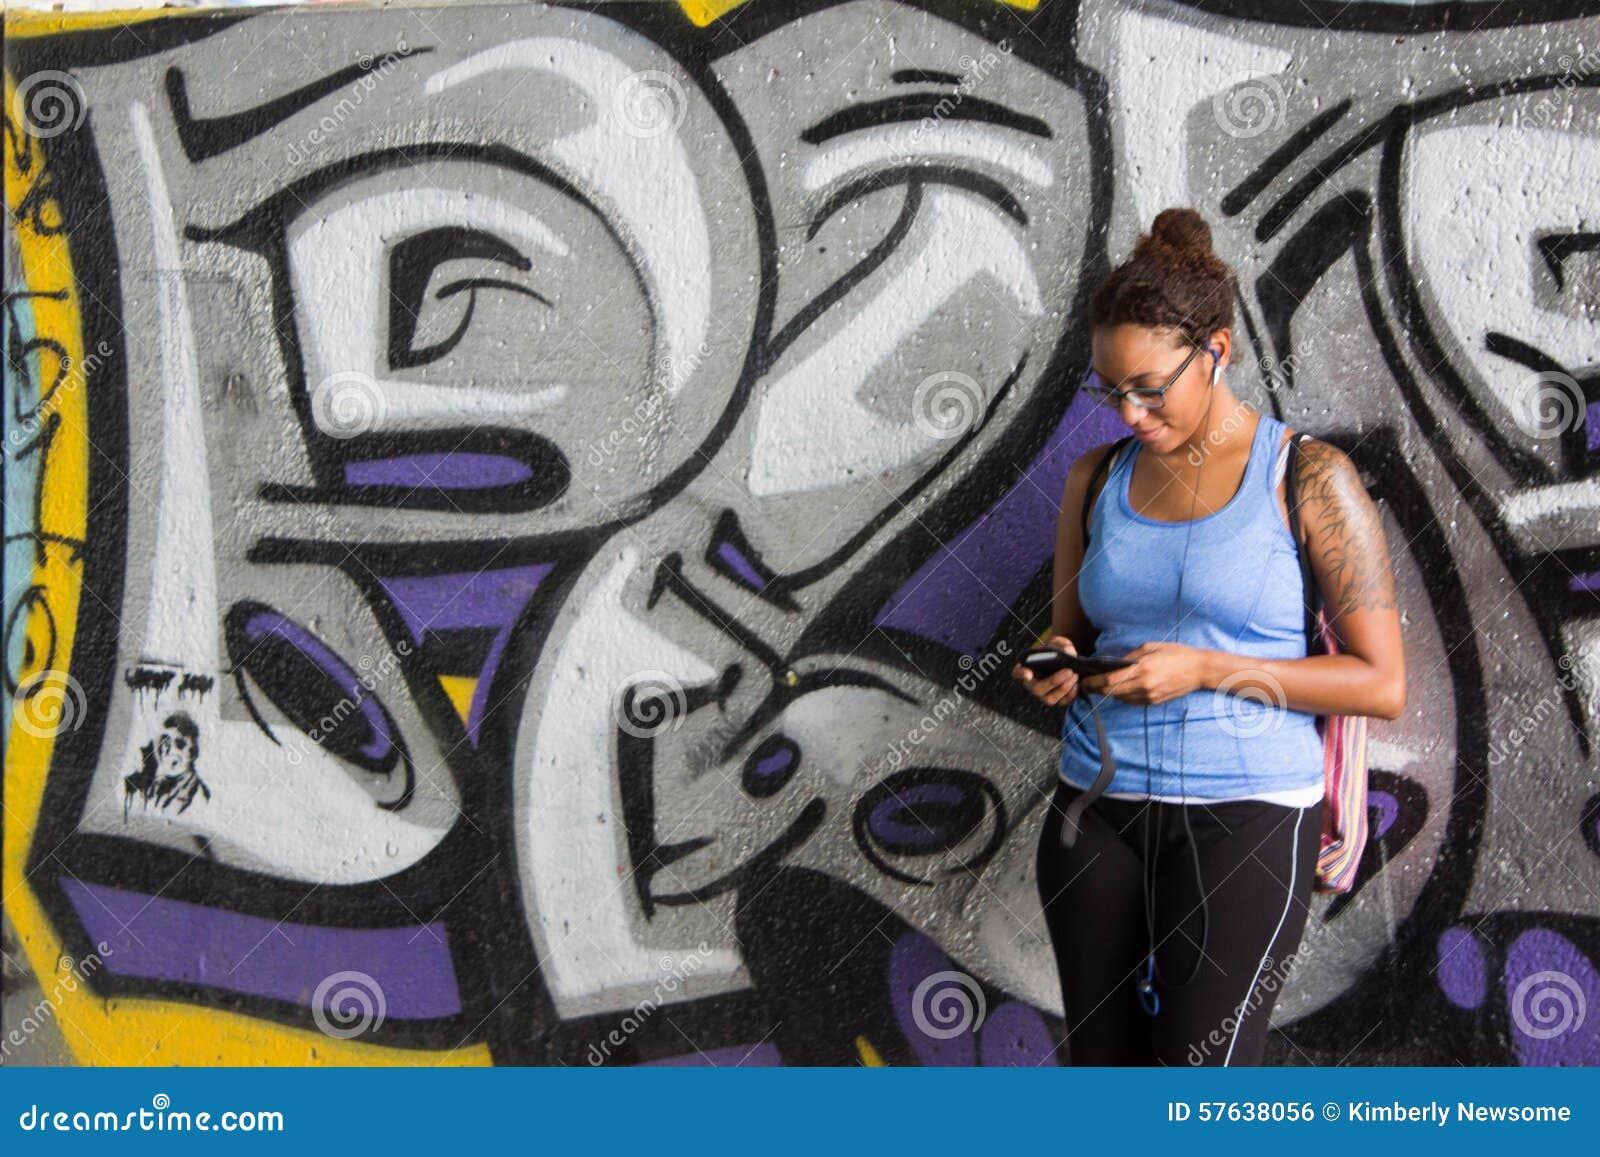 Graffiti wall tattoo - Tattooed Girl In Leaning On Graffiti Wall Royalty Free Stock Image